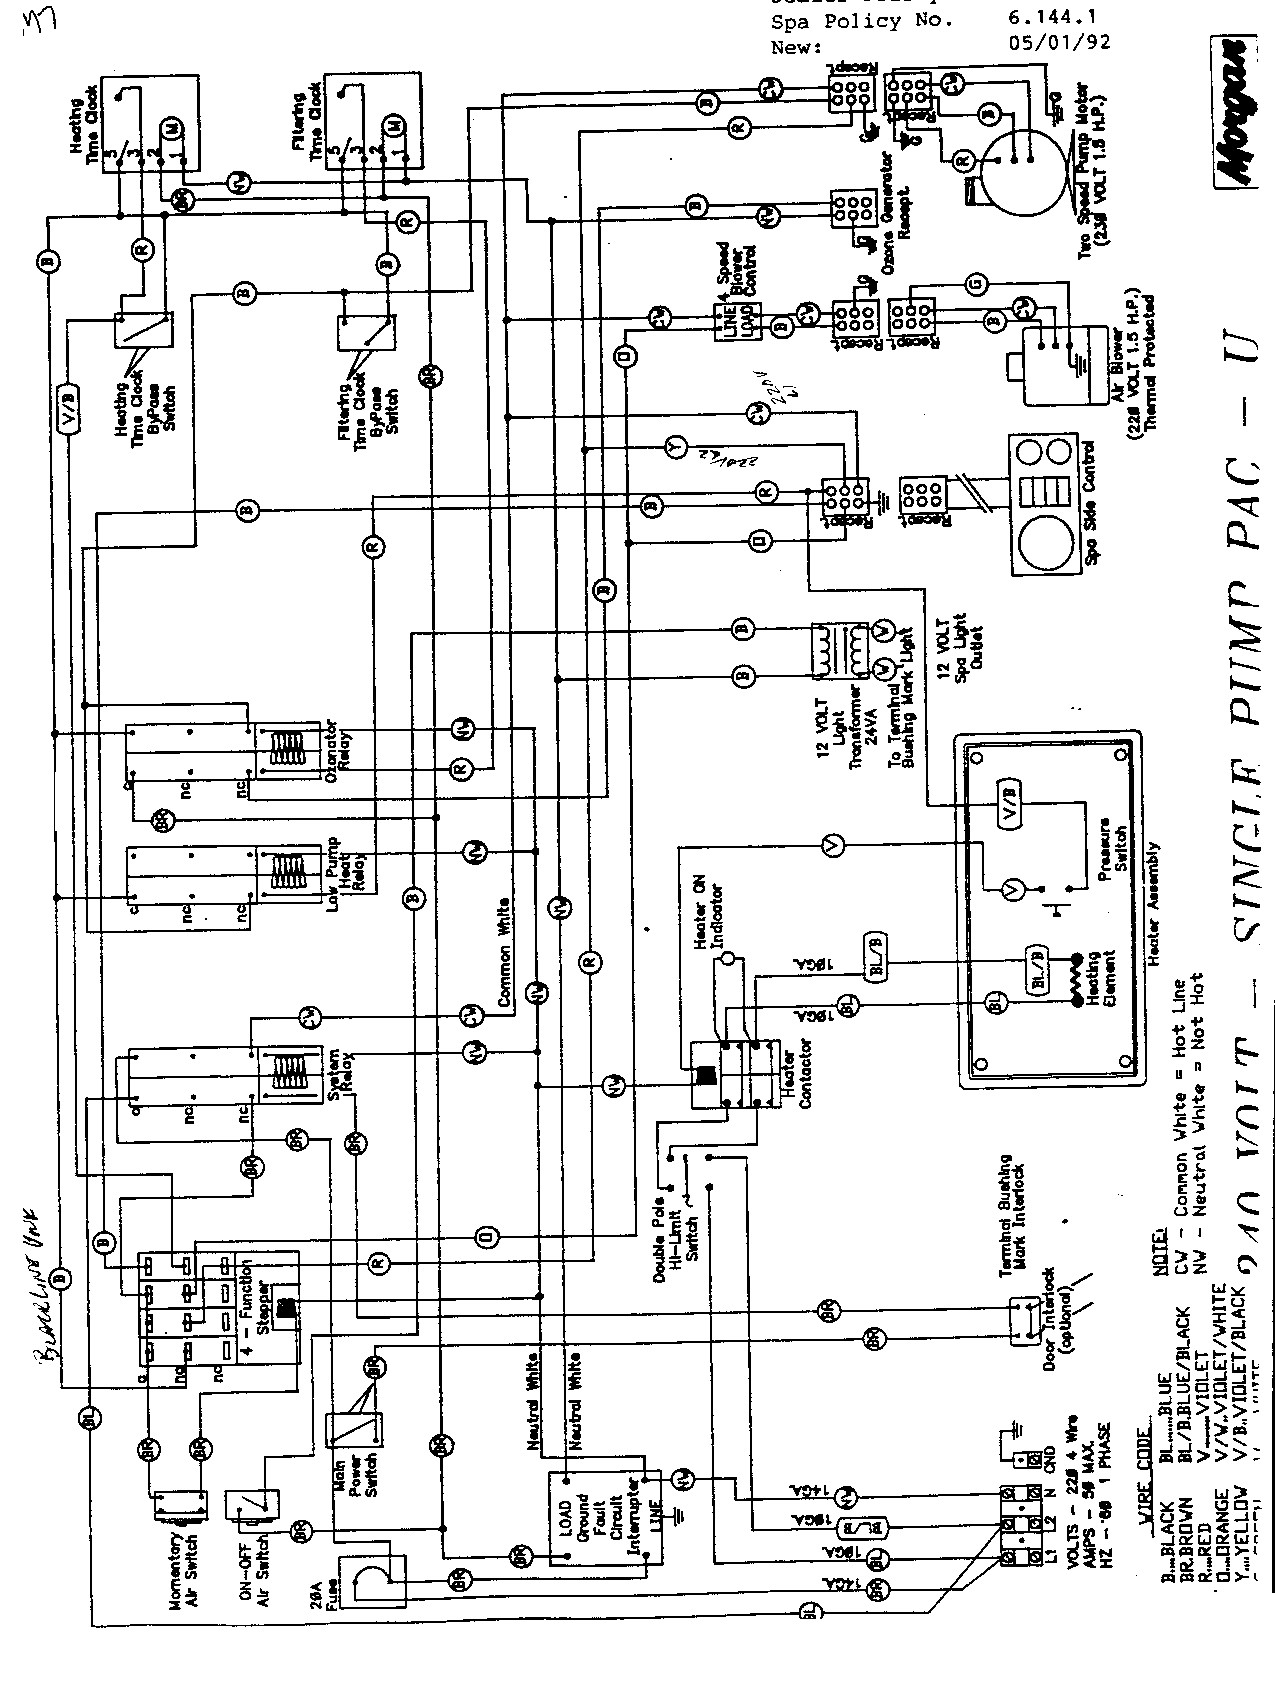 Hot Spring Spa Wiring Diagram Hot Tub Wiring Diagram New Morgan Wiring Diagram With Simple